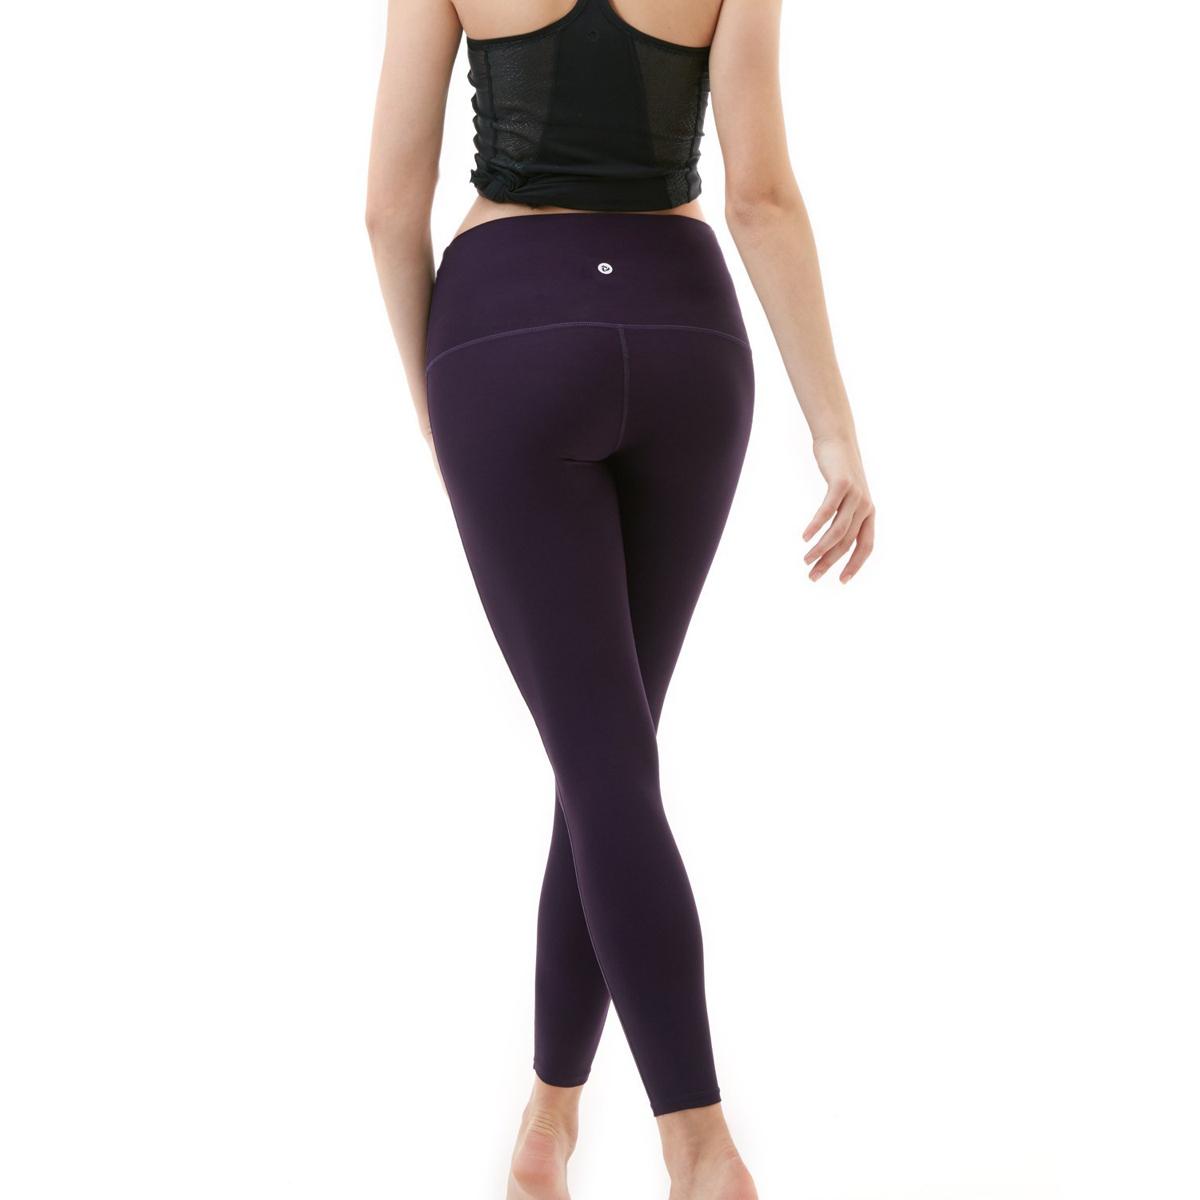 thumbnail 34 - TSLA Tesla FYP42 Women's High-Waisted Ultra-Stretch Tummy Control Yoga Pants